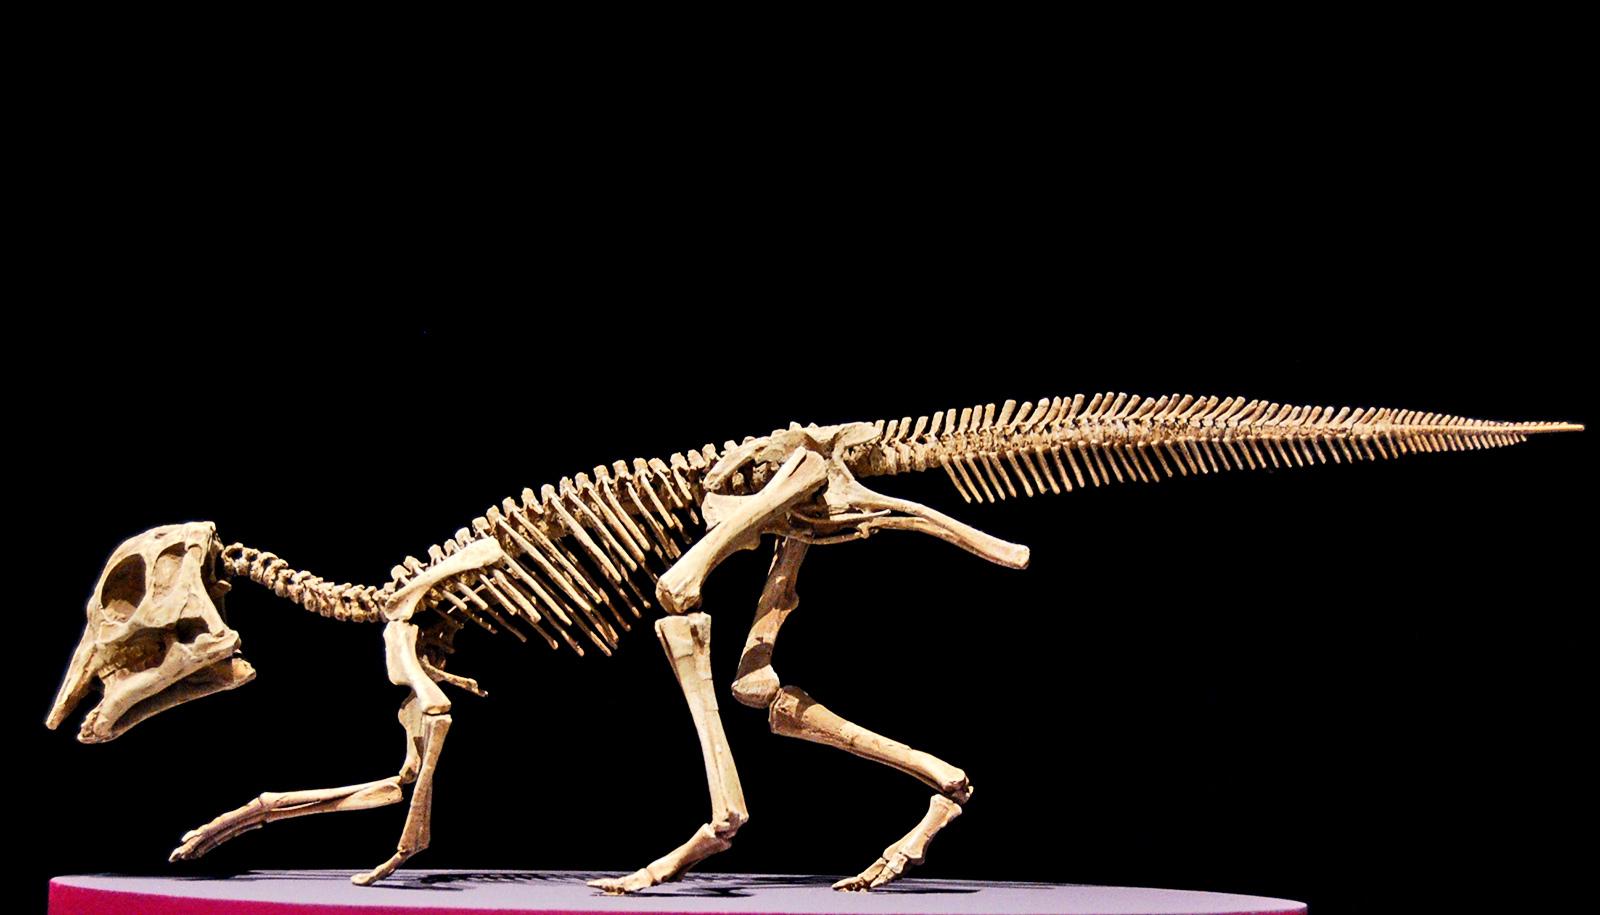 DNA fragments may persist in baby dinosaur cartilage